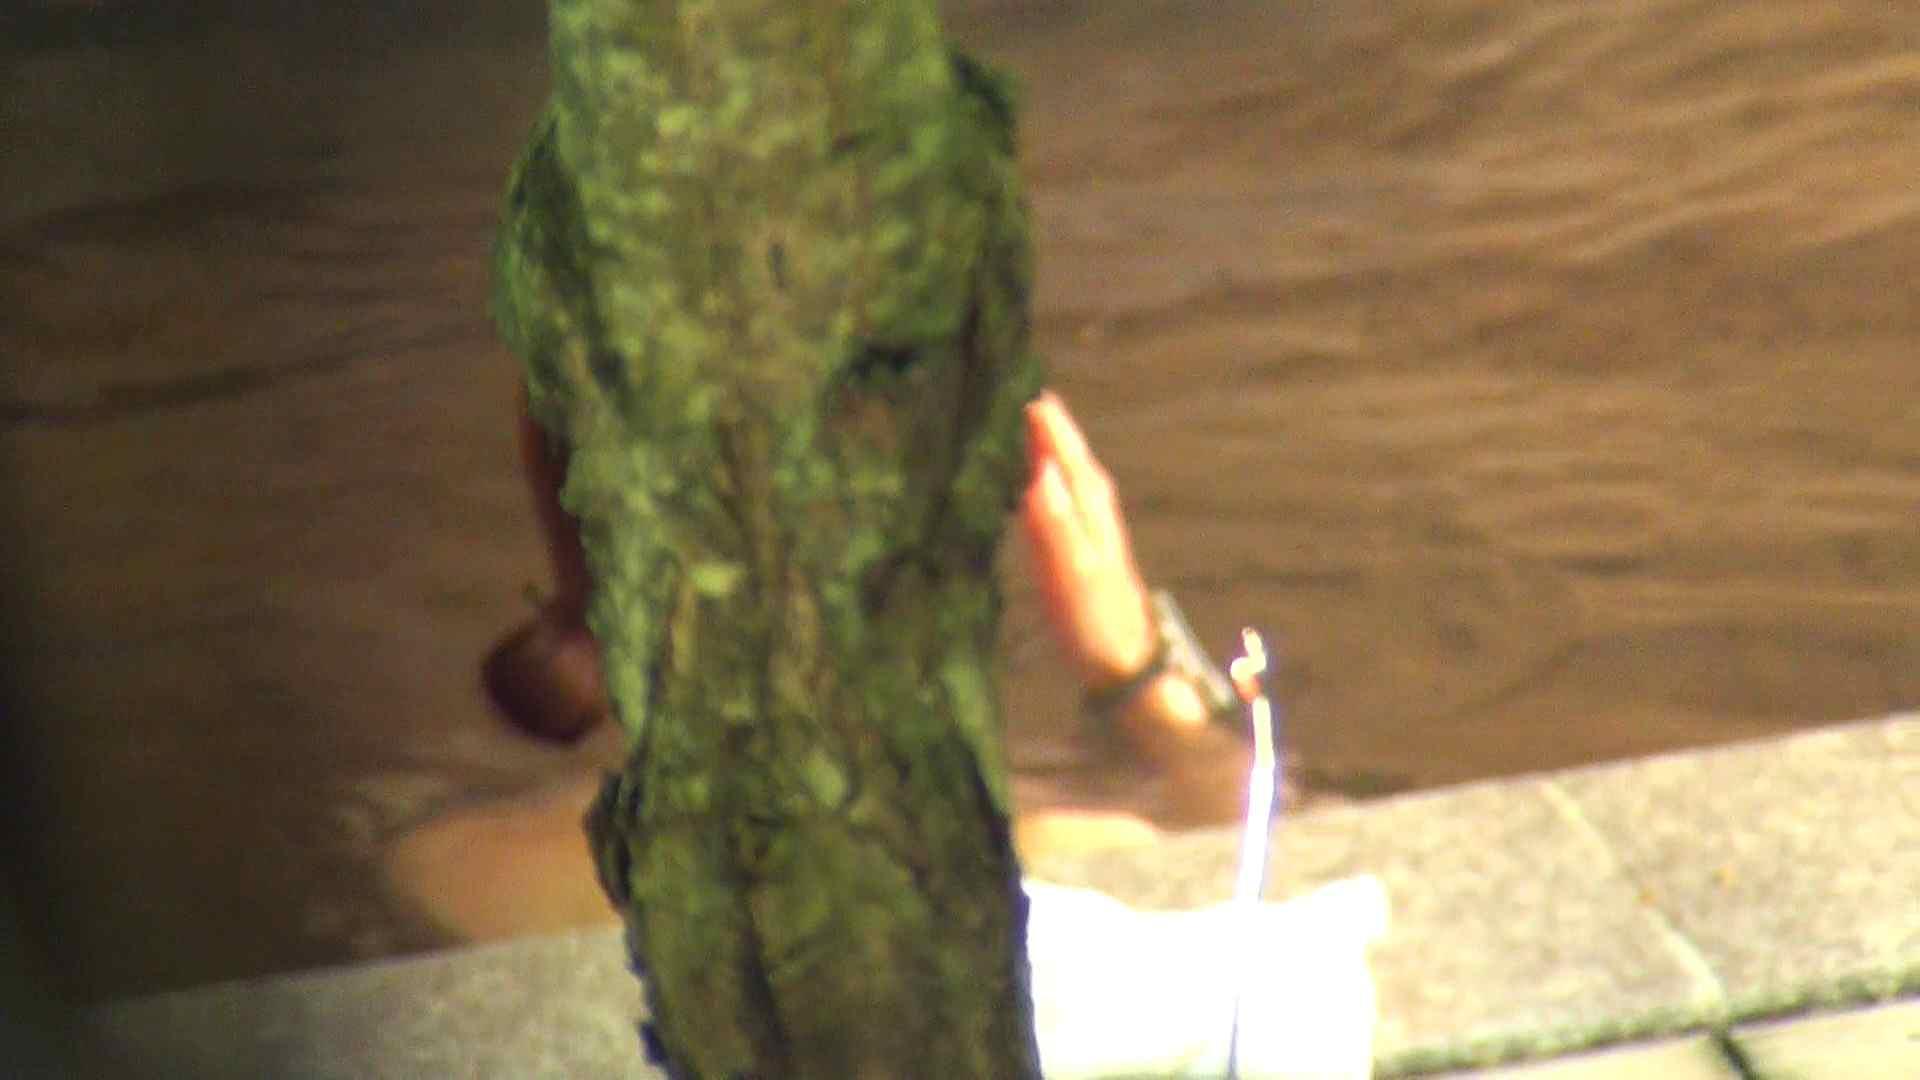 Vol.41 色形完璧な肉体を持つ奥様 細身体型 オマンコ無修正動画無料 109枚 66